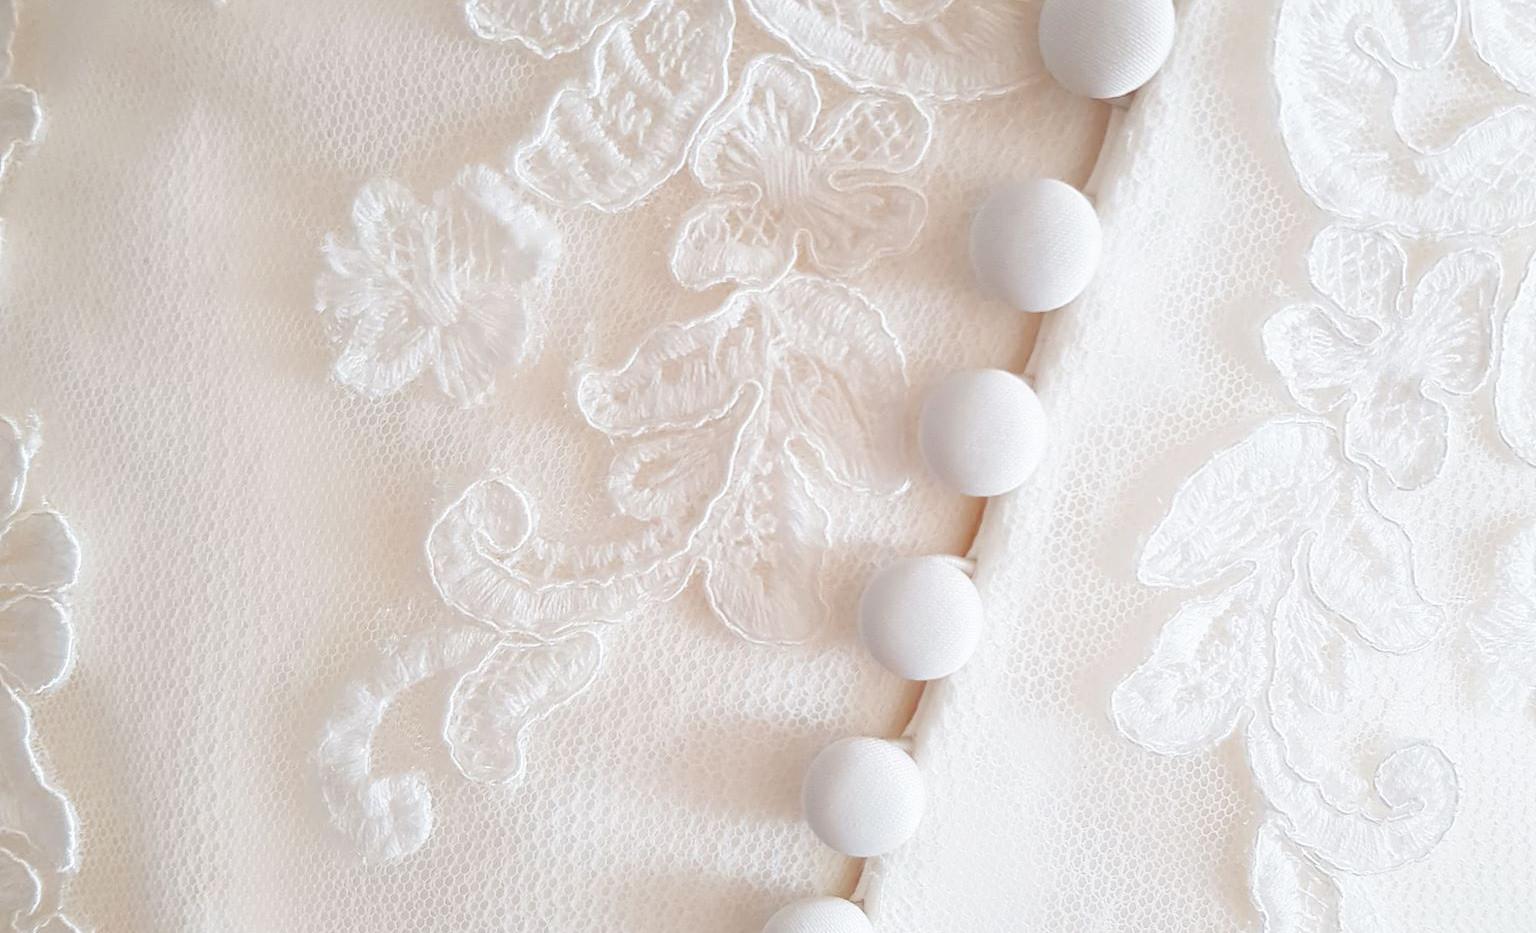 071-White-one-12.jpg